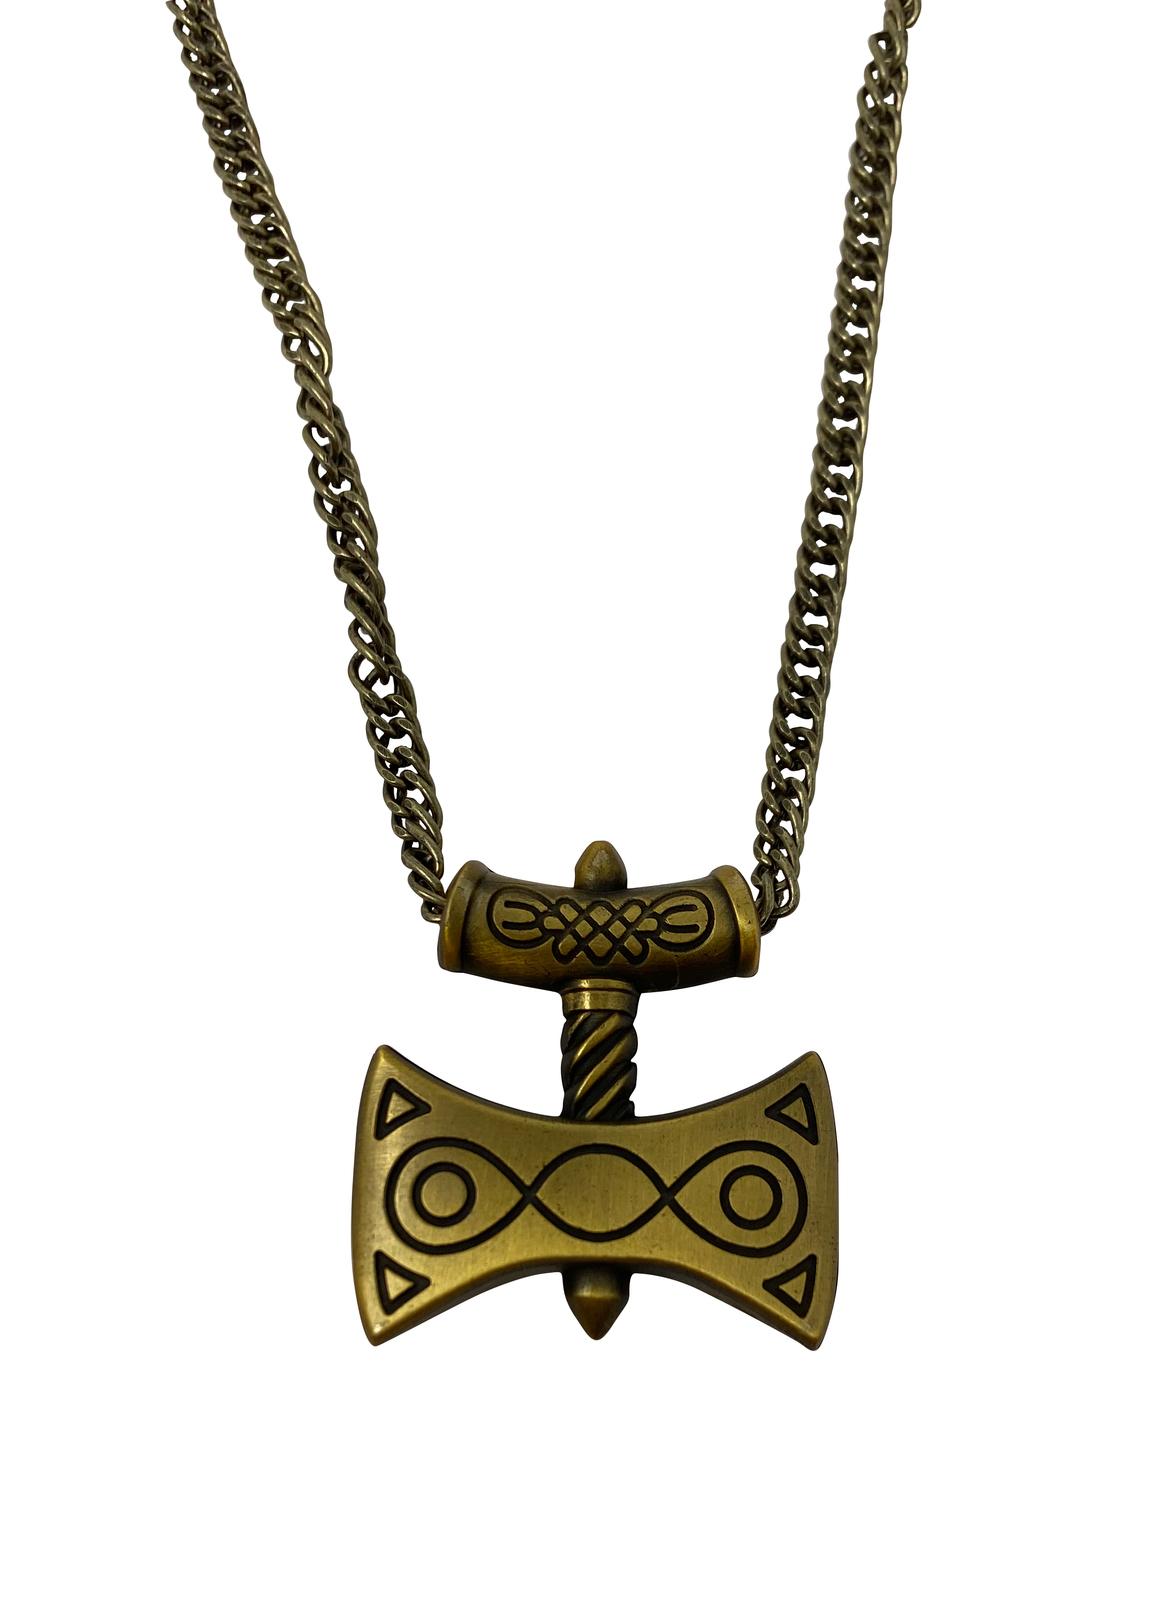 Elder Scrolls Skyrim: Replica Necklace - Amulet of Talos image